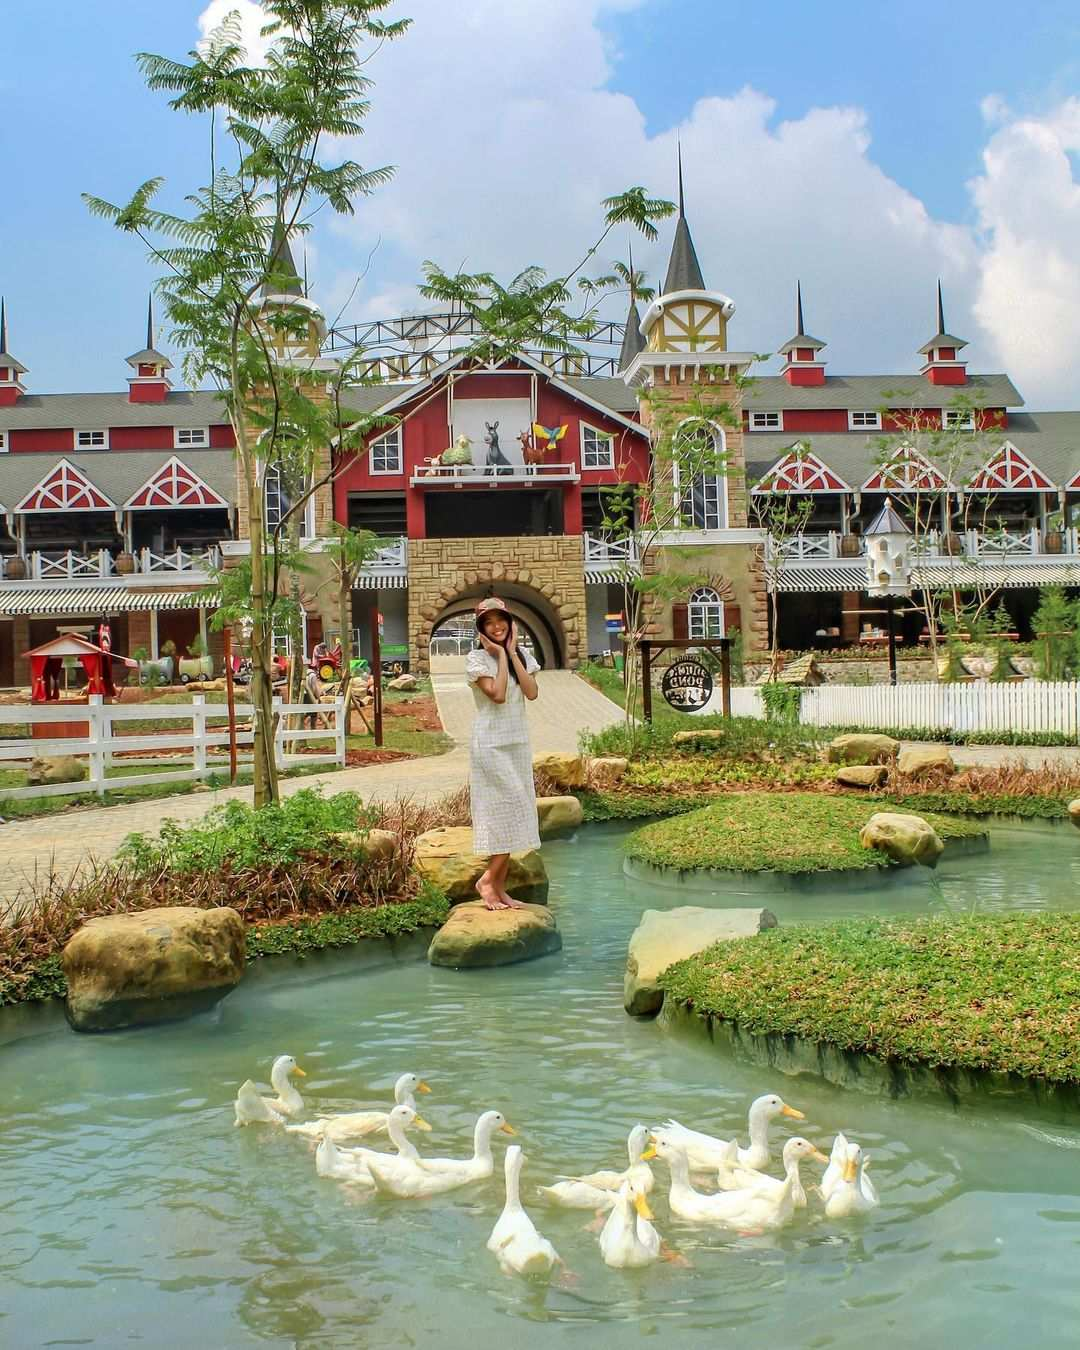 Duck Pond Di Cimory Dairyland Puncak Image From @cimorydairyland Puncak